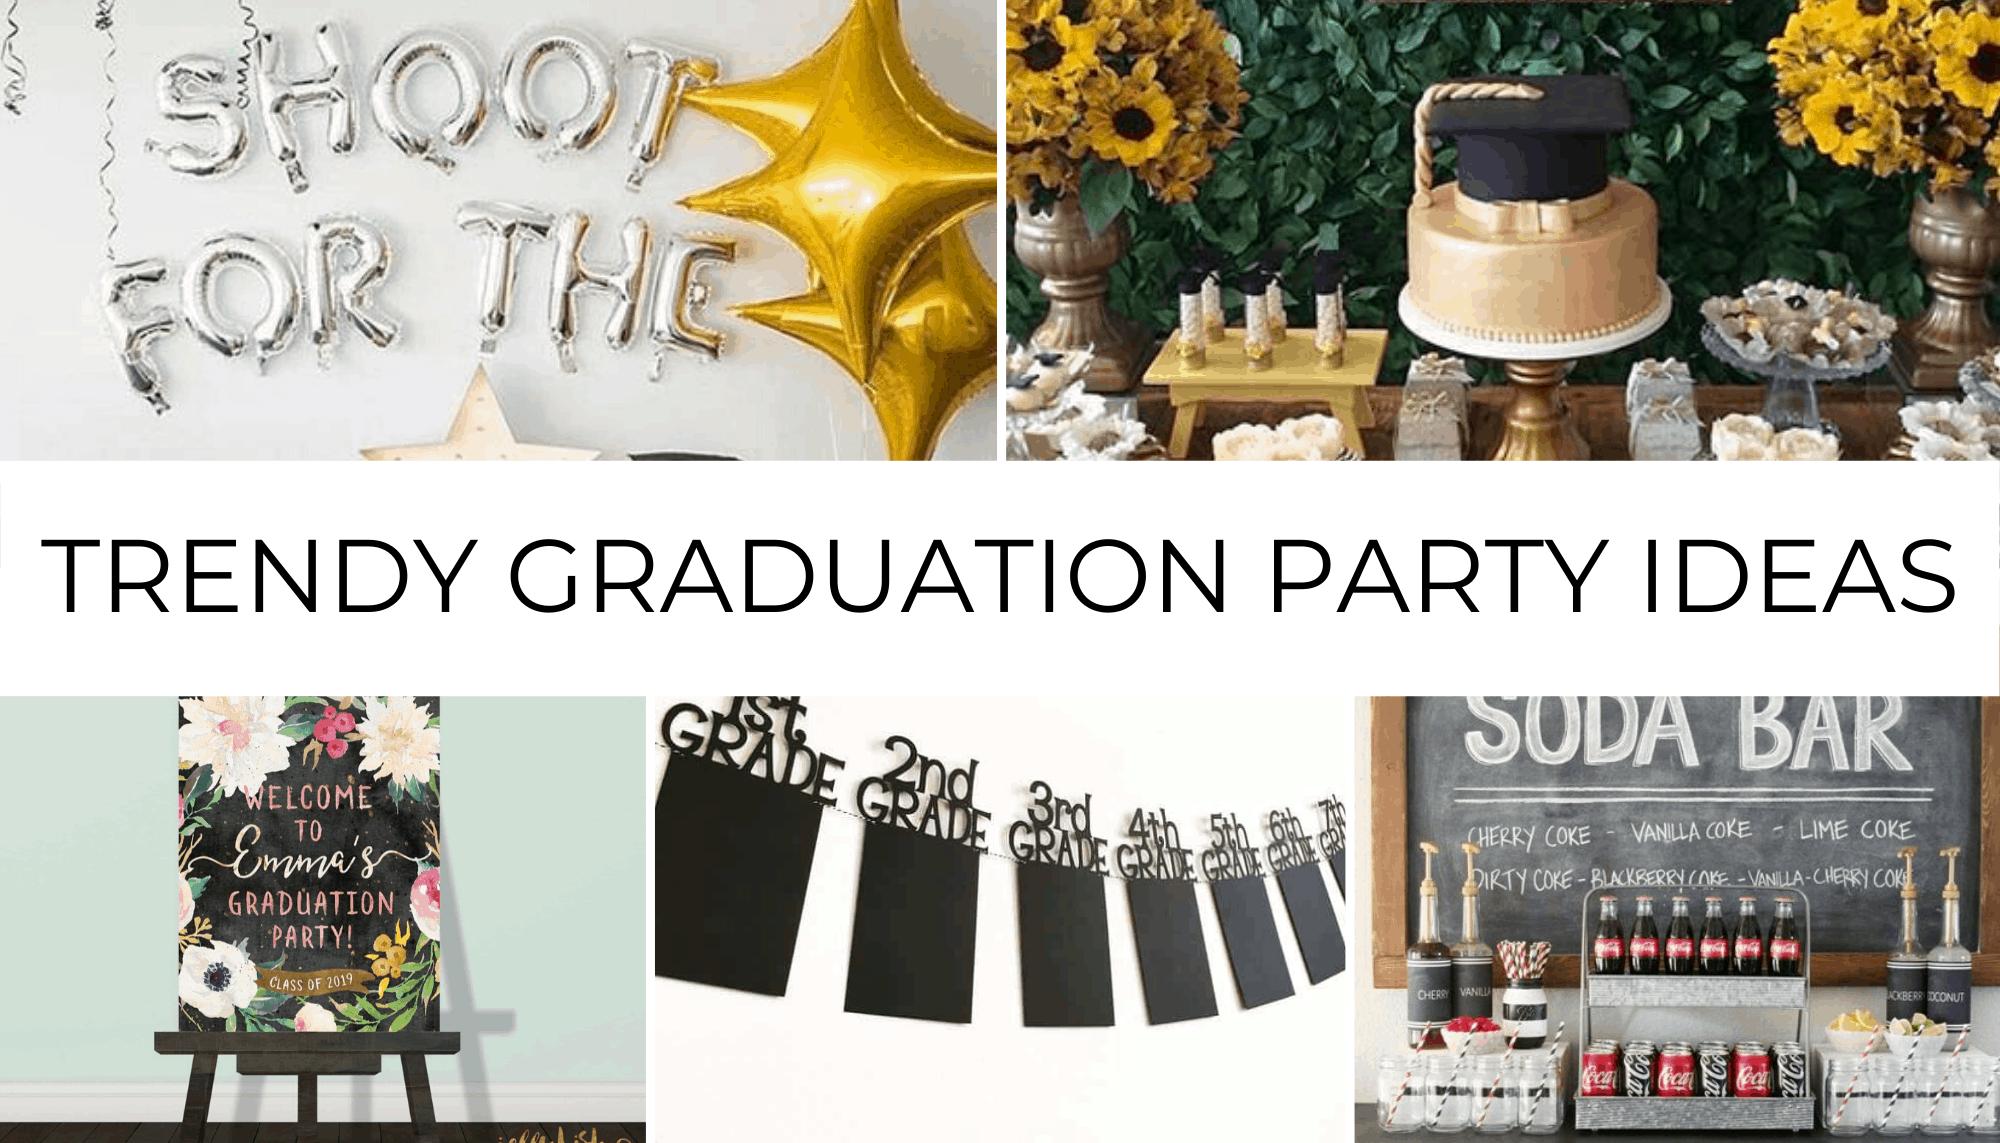 Trendy Graduation Party Ideas